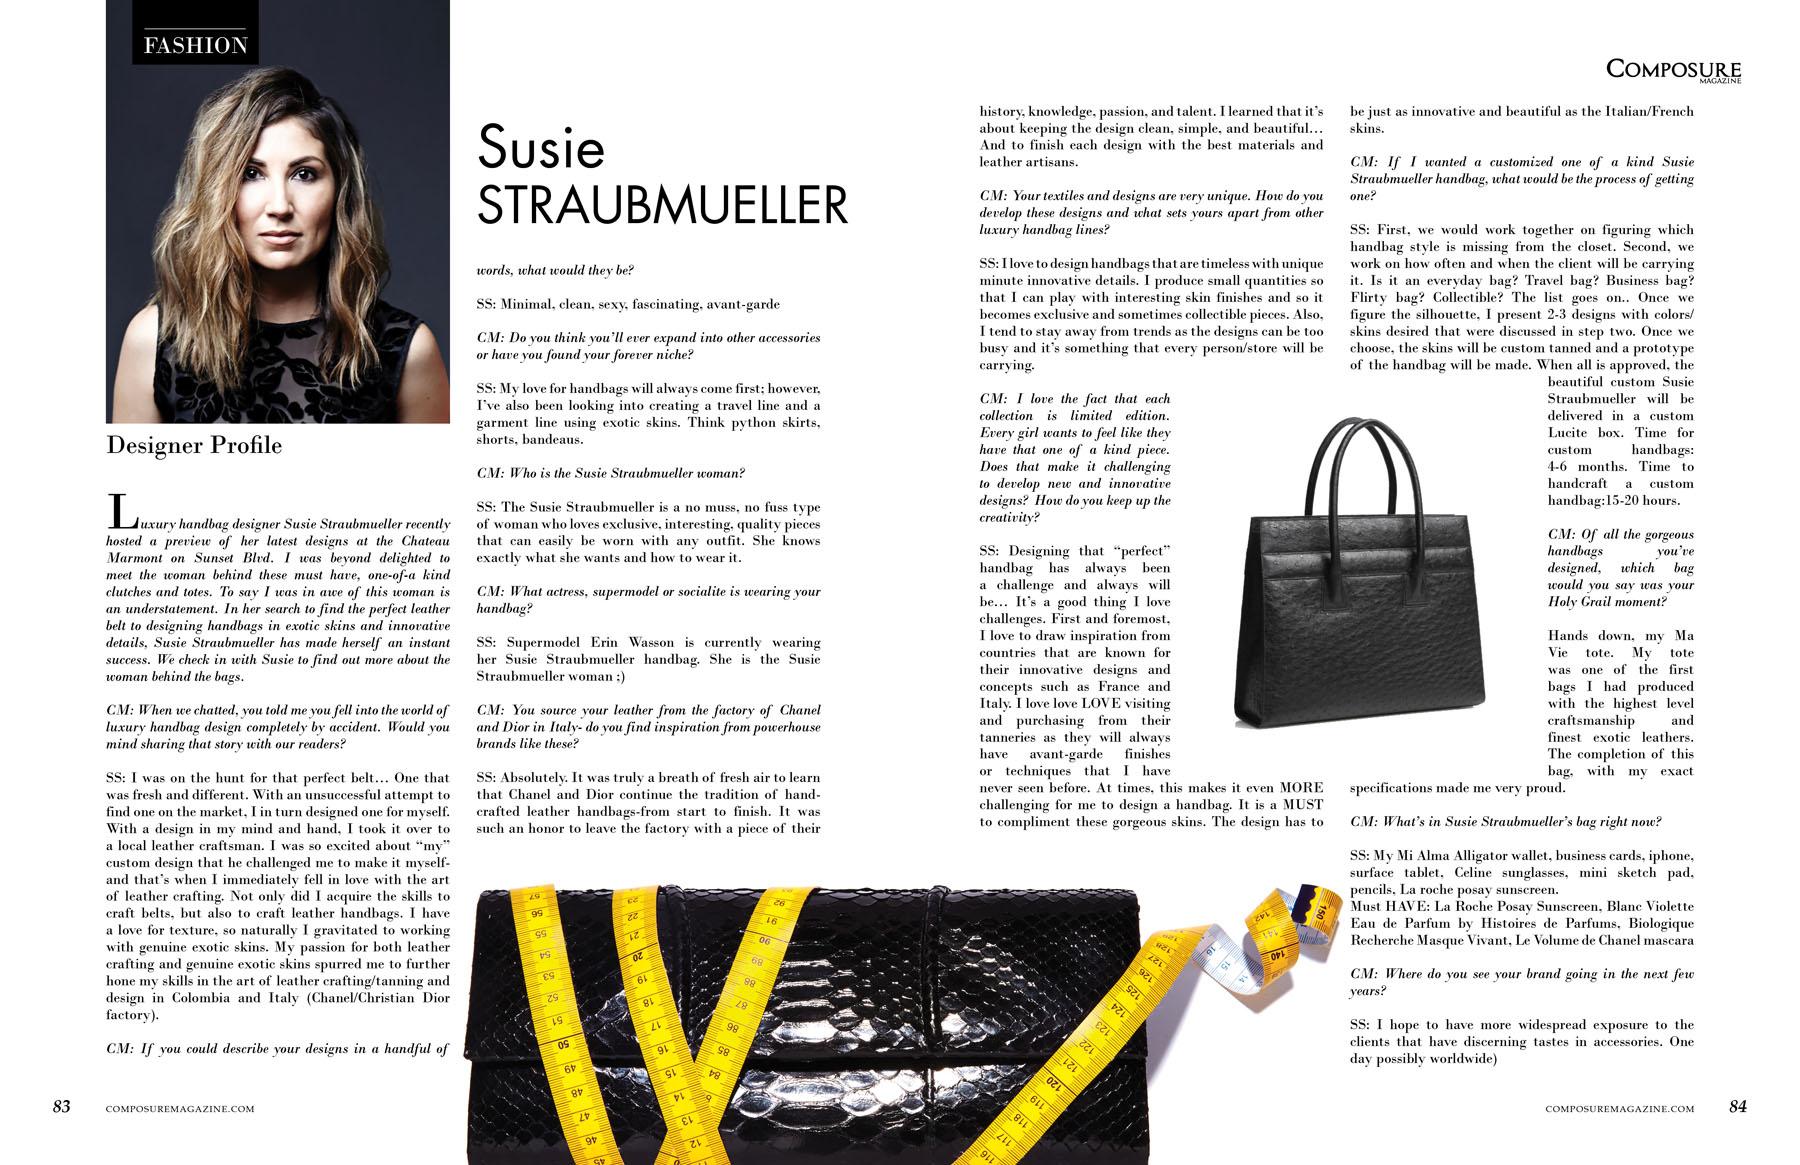 Fashion Designer Profile Susie Straubmueller Composure Magazine